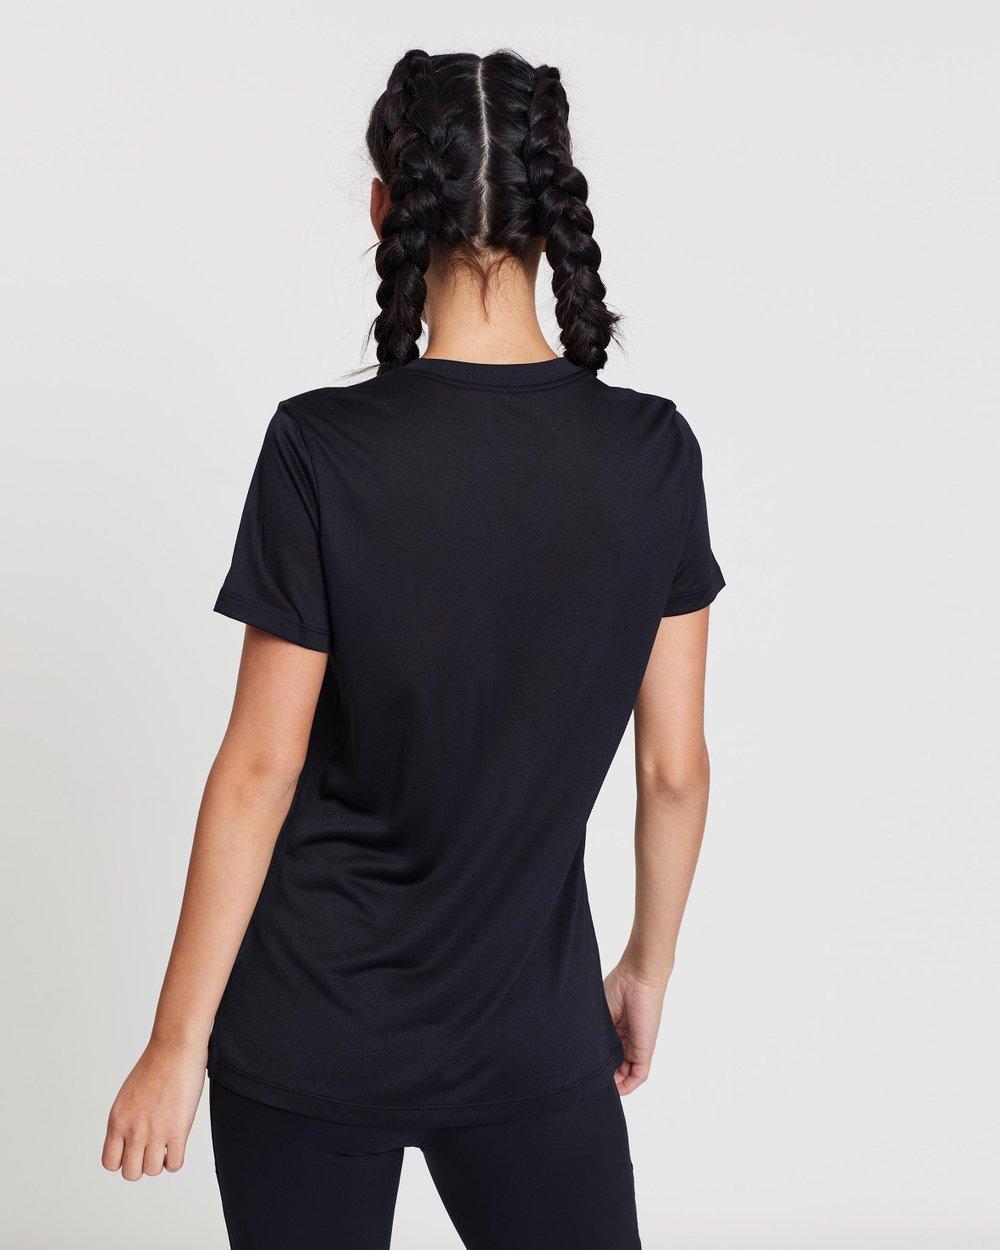 55a7cbf1ebc75 Dry Legend Training T-Shirt by Nike Online